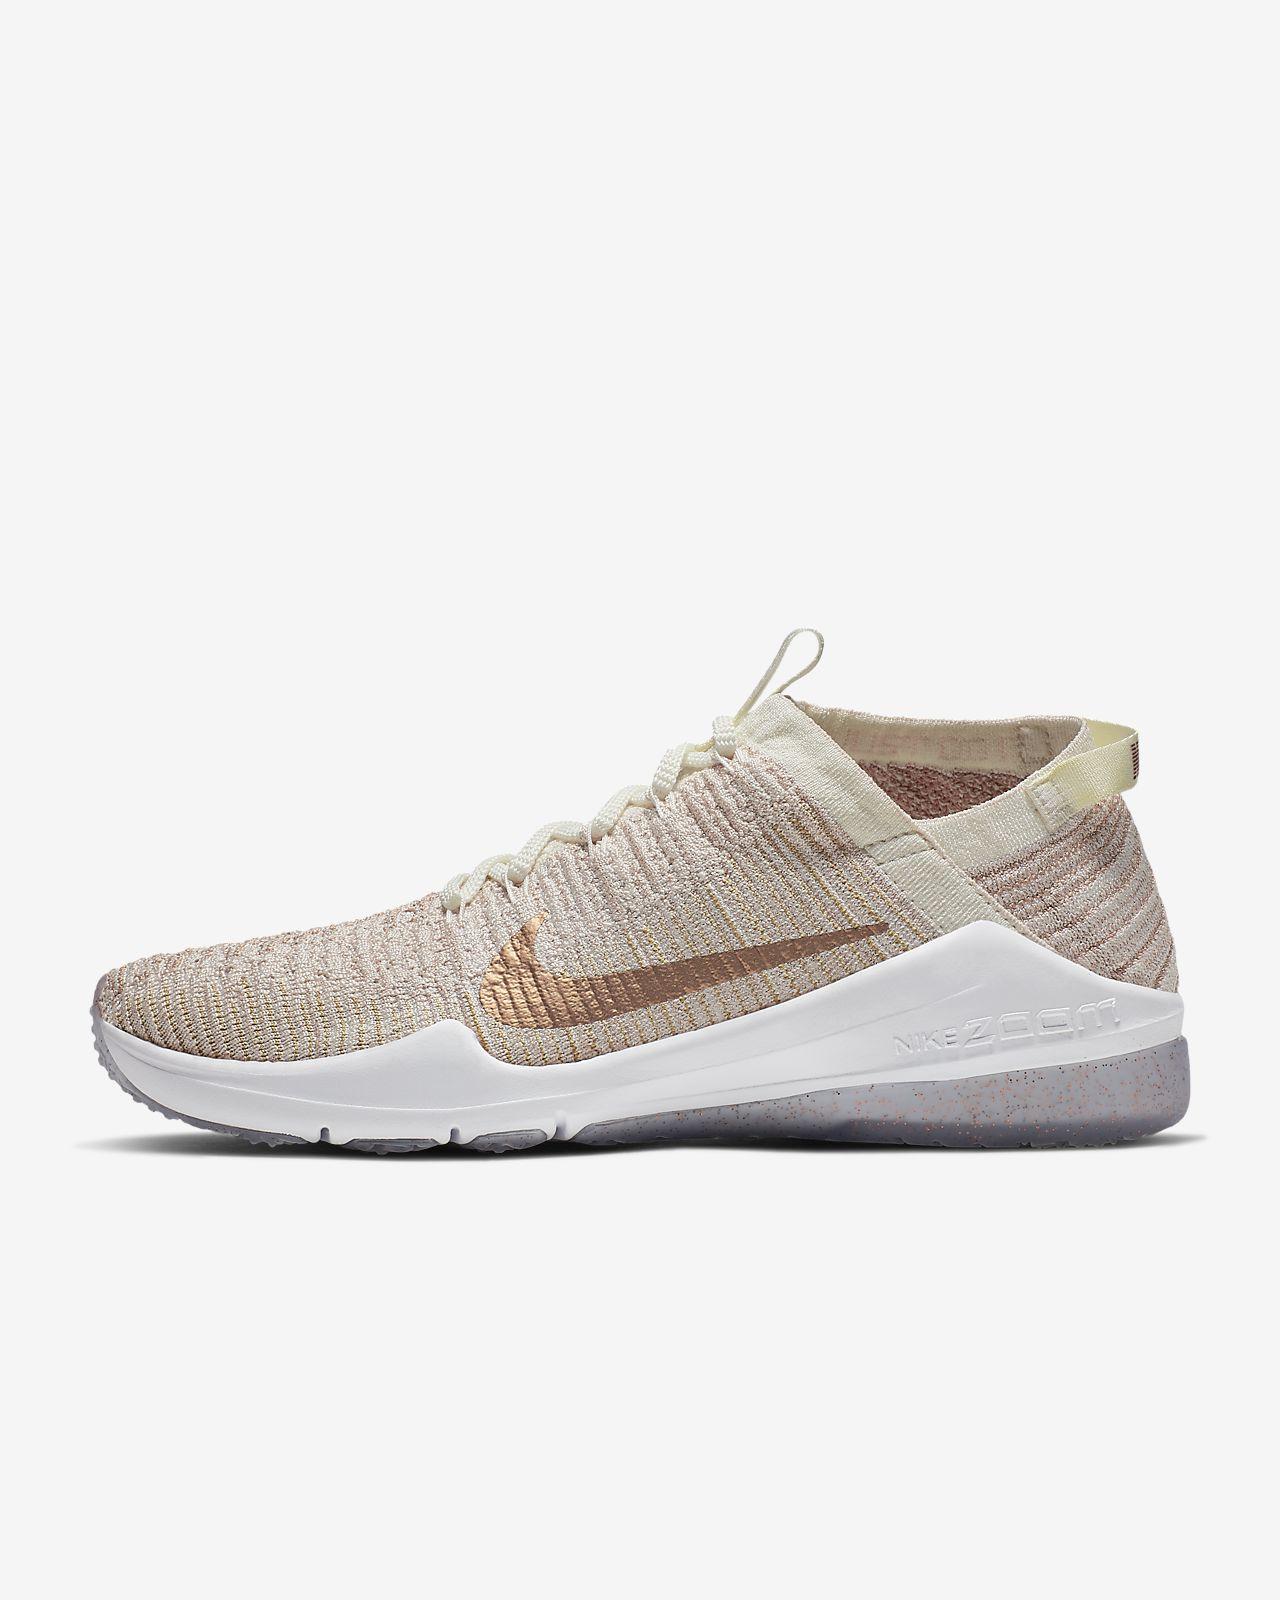 Nike Air Zoom Fearless Flyknit 2 Metallic Trainingsschoen voor dames